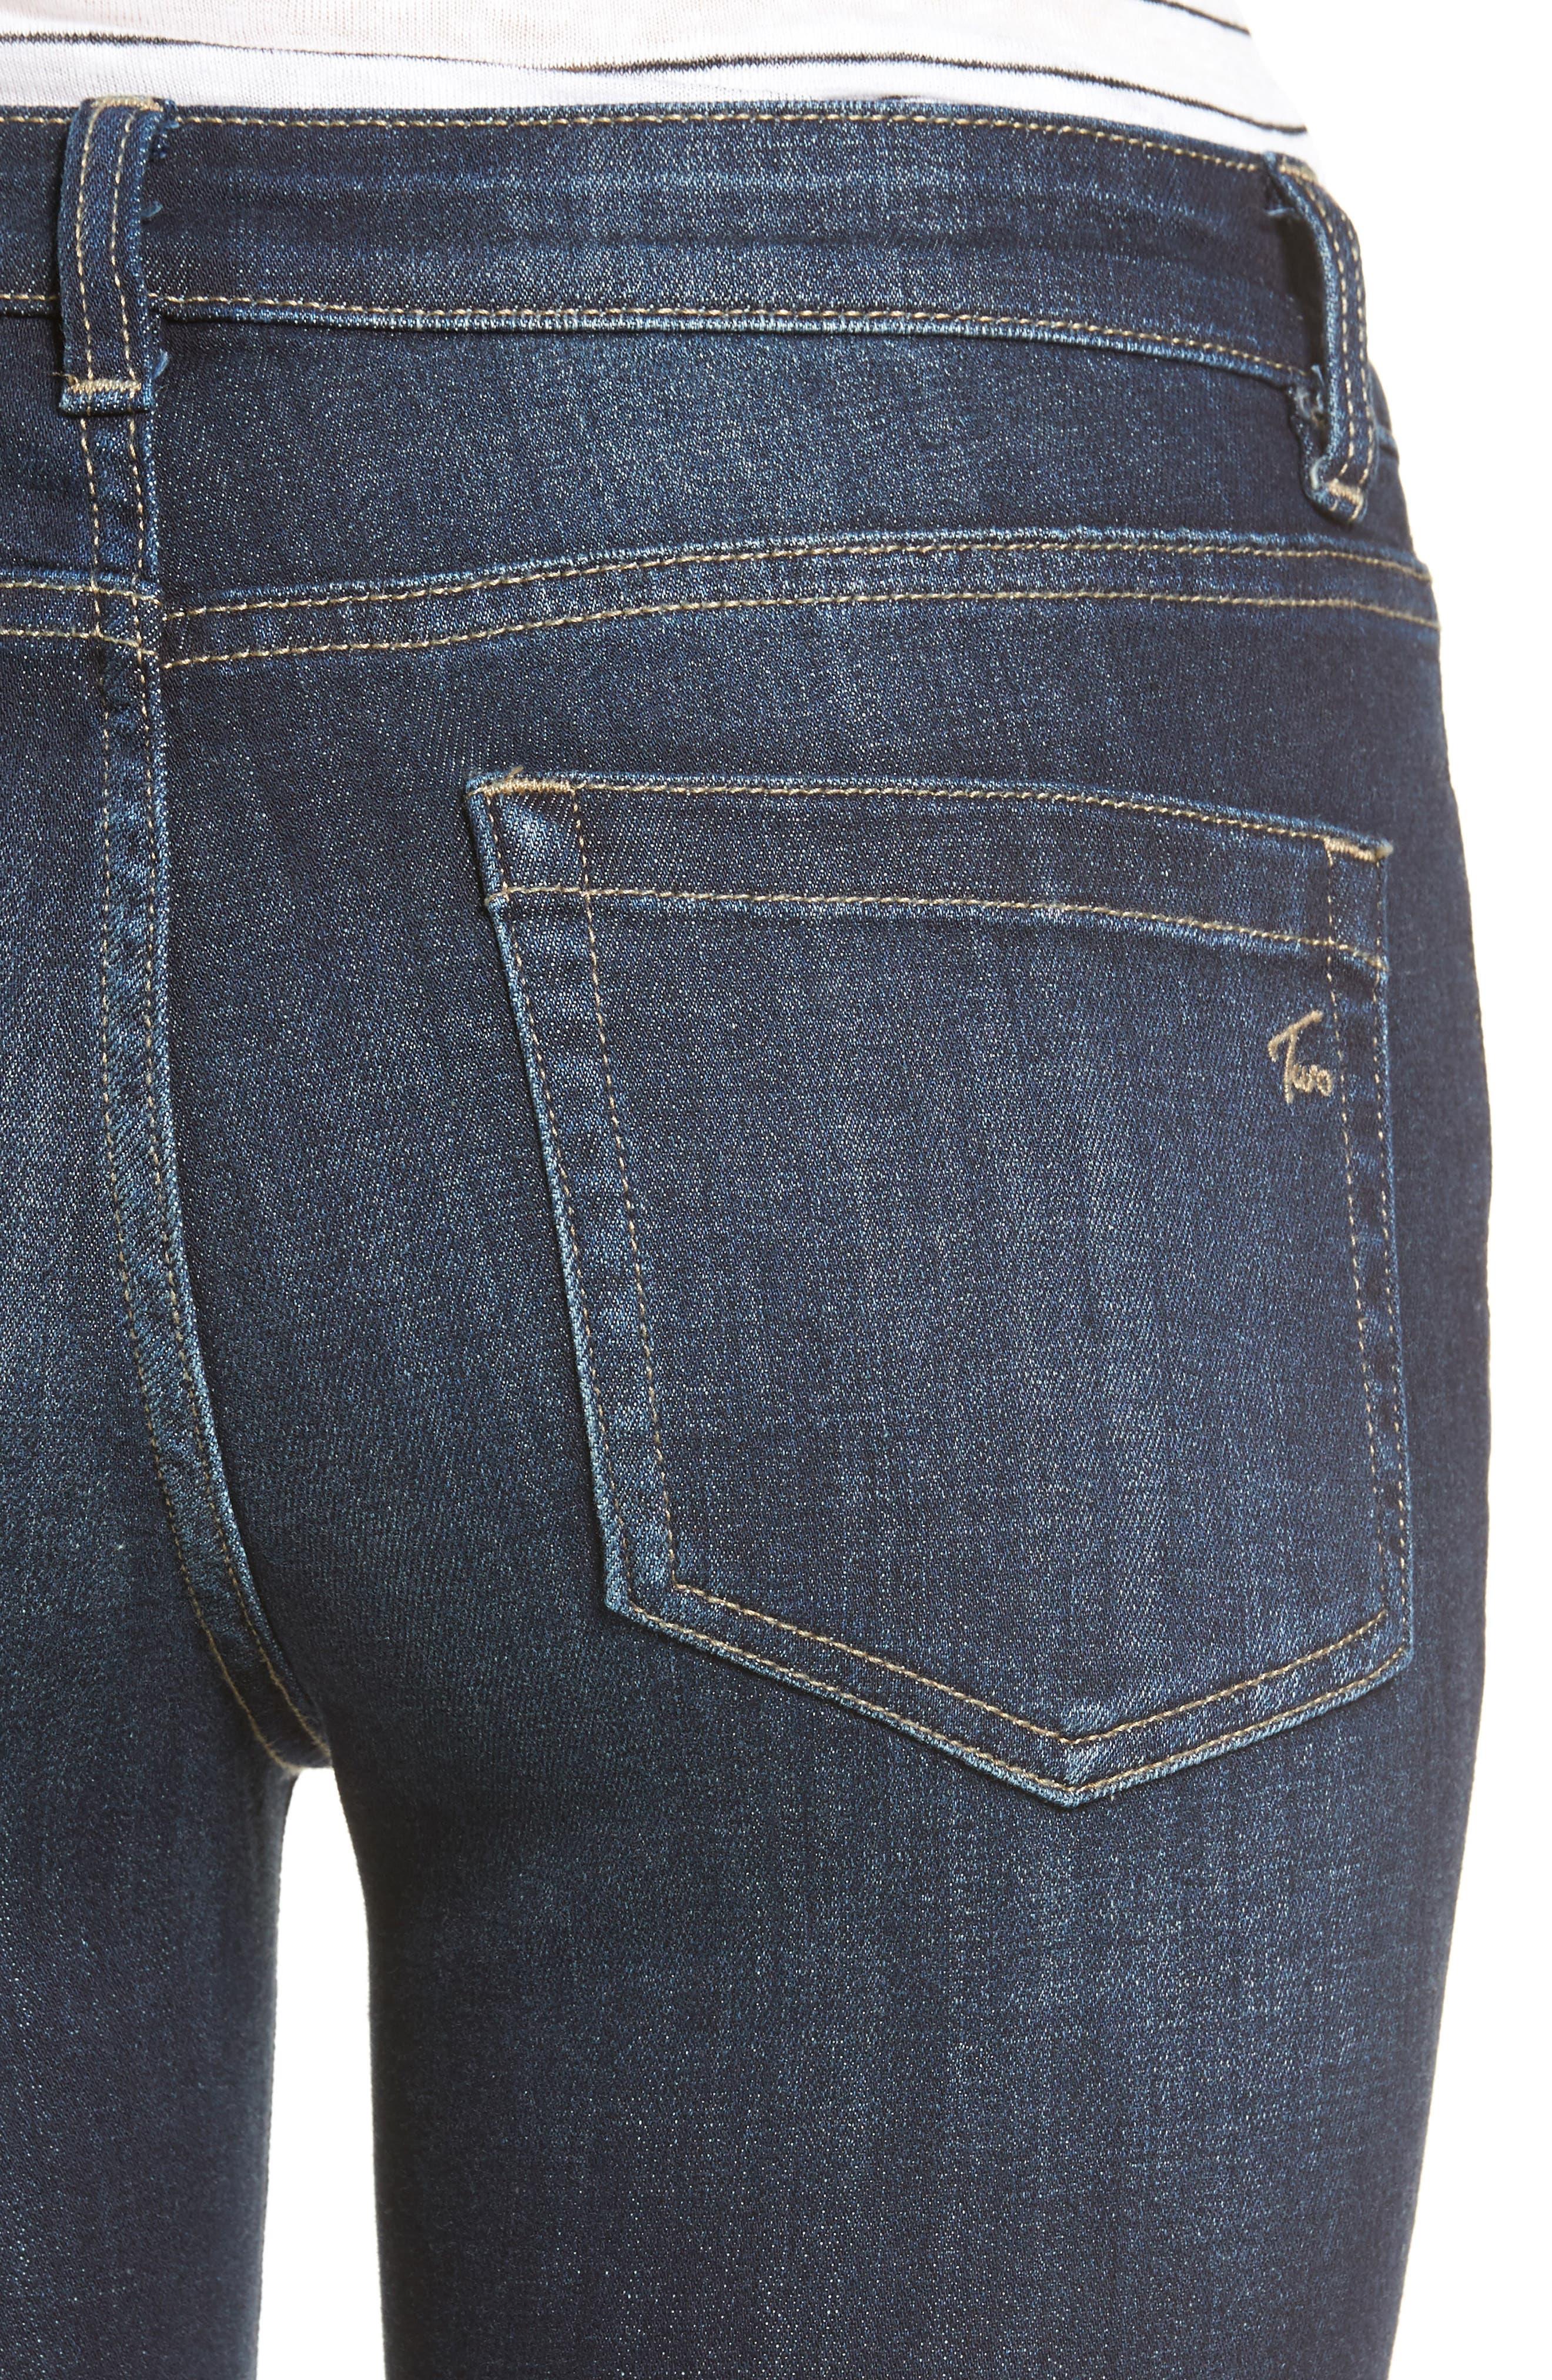 Release Hem Skinny Jeans,                             Alternate thumbnail 4, color,                             DARK AUTHENTIC